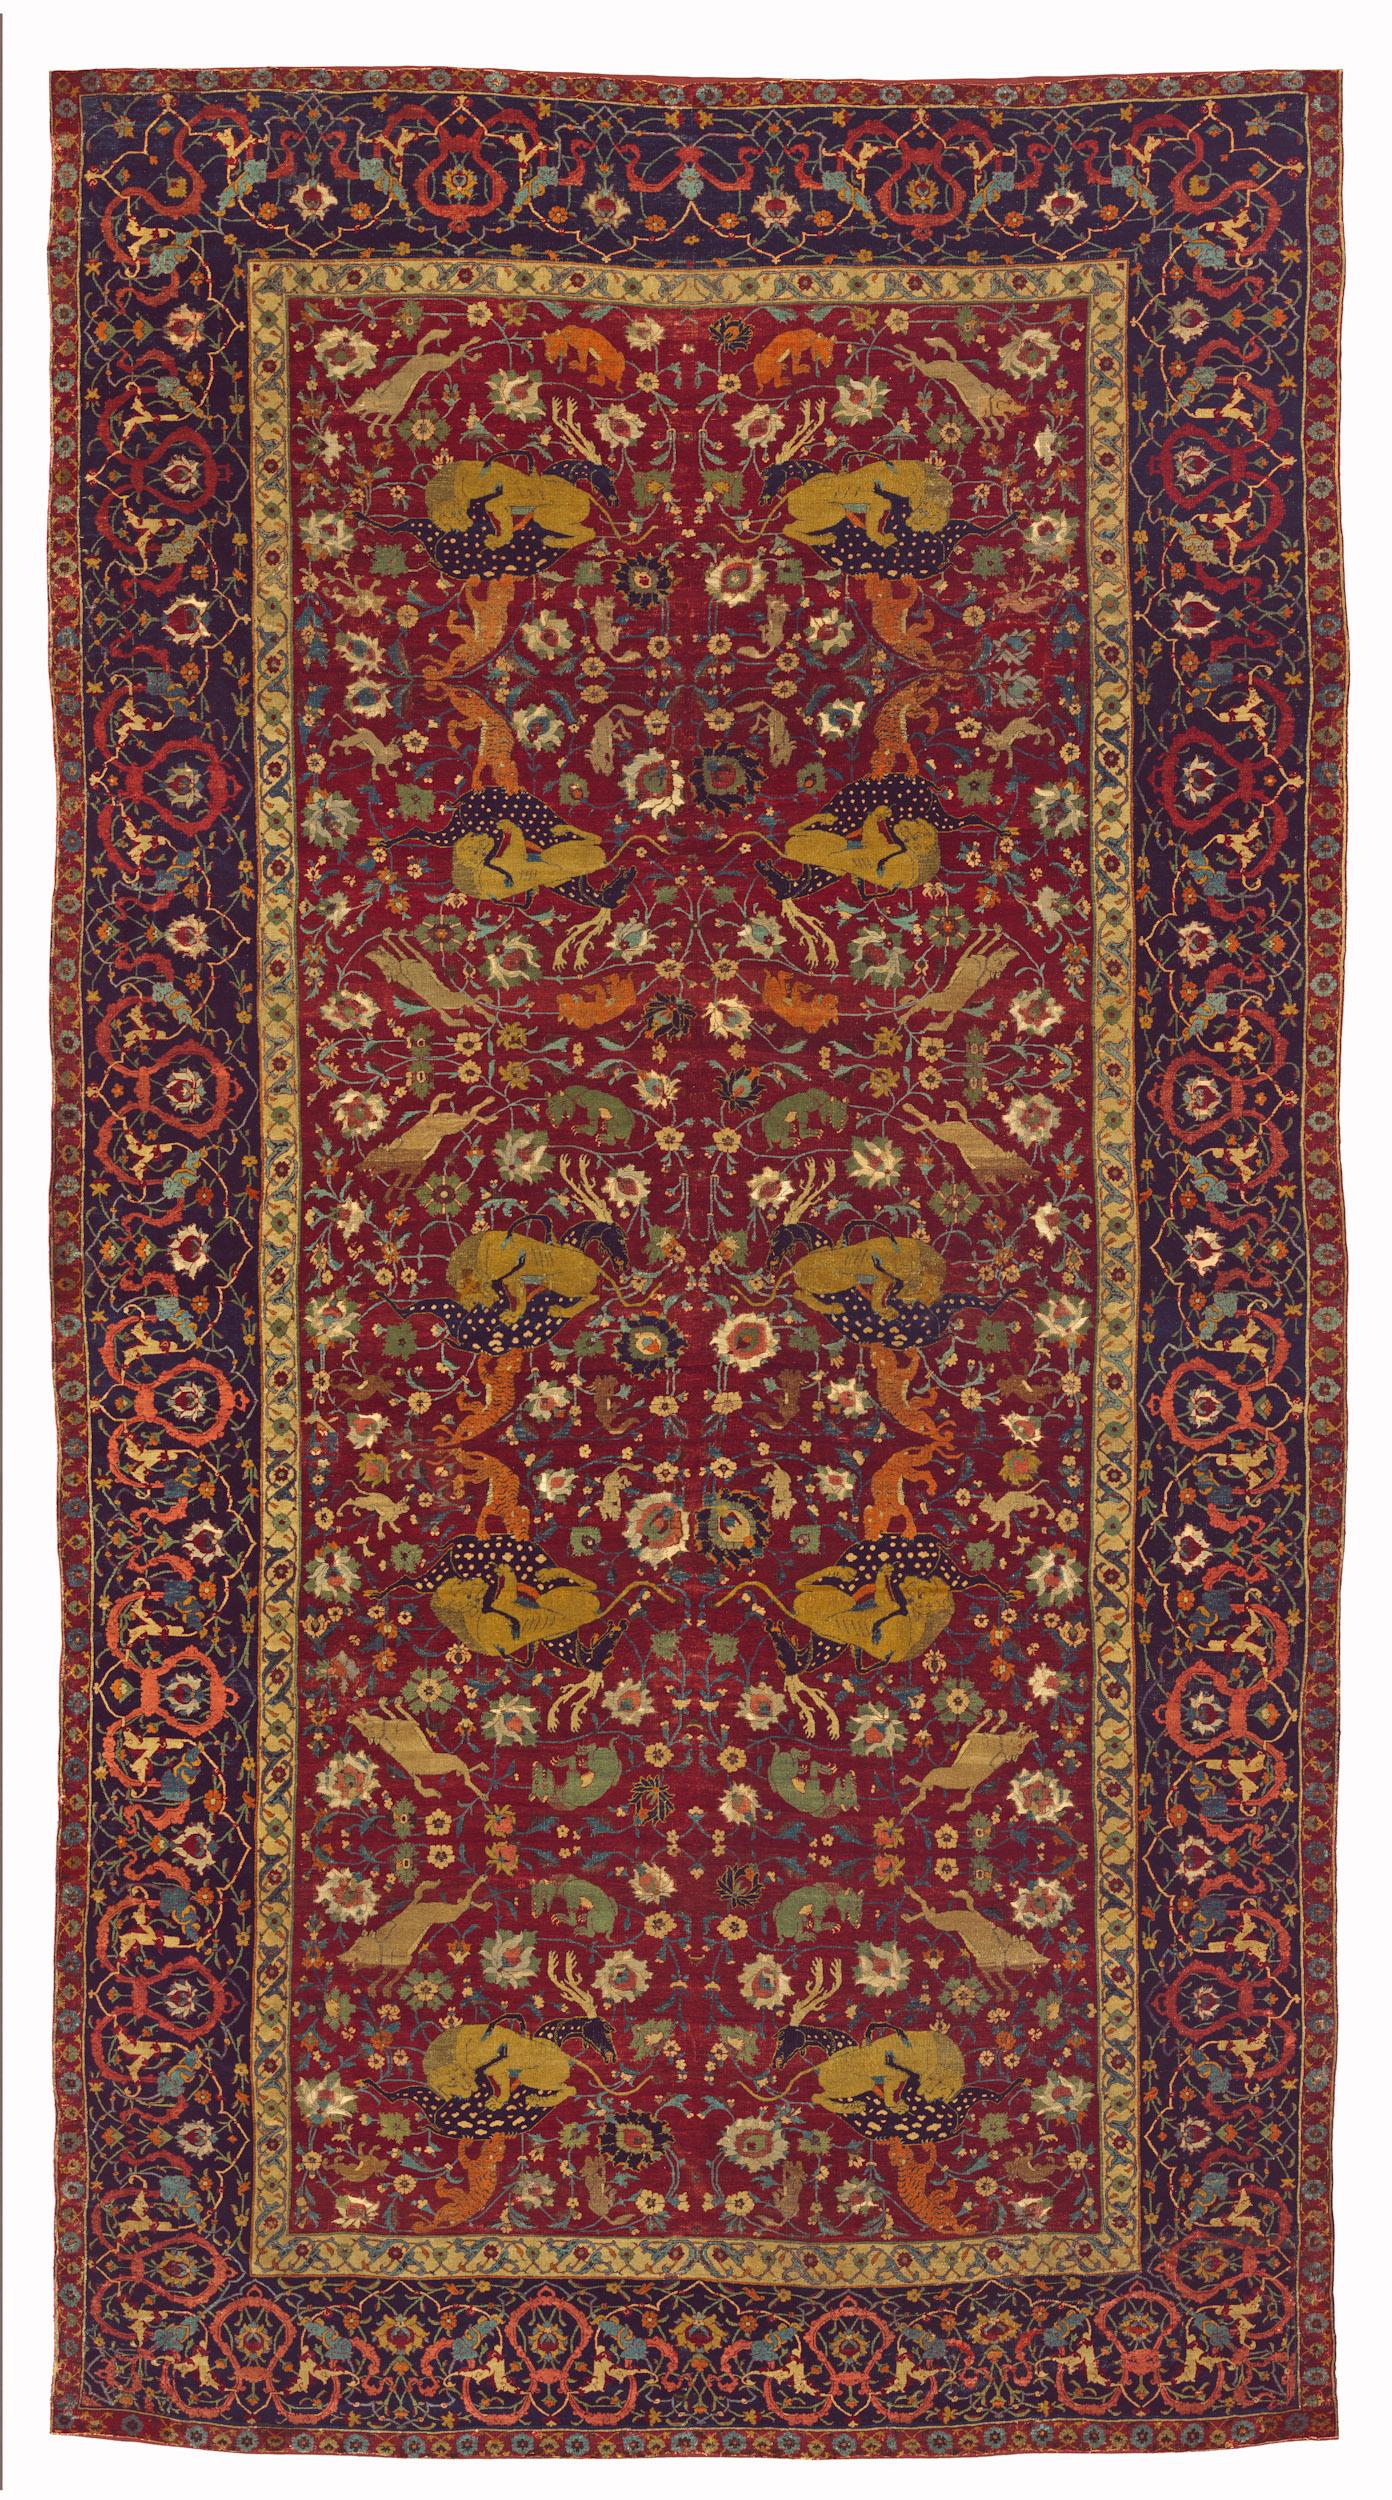 Carpets And Islamic Art At The Mia Doha Hali